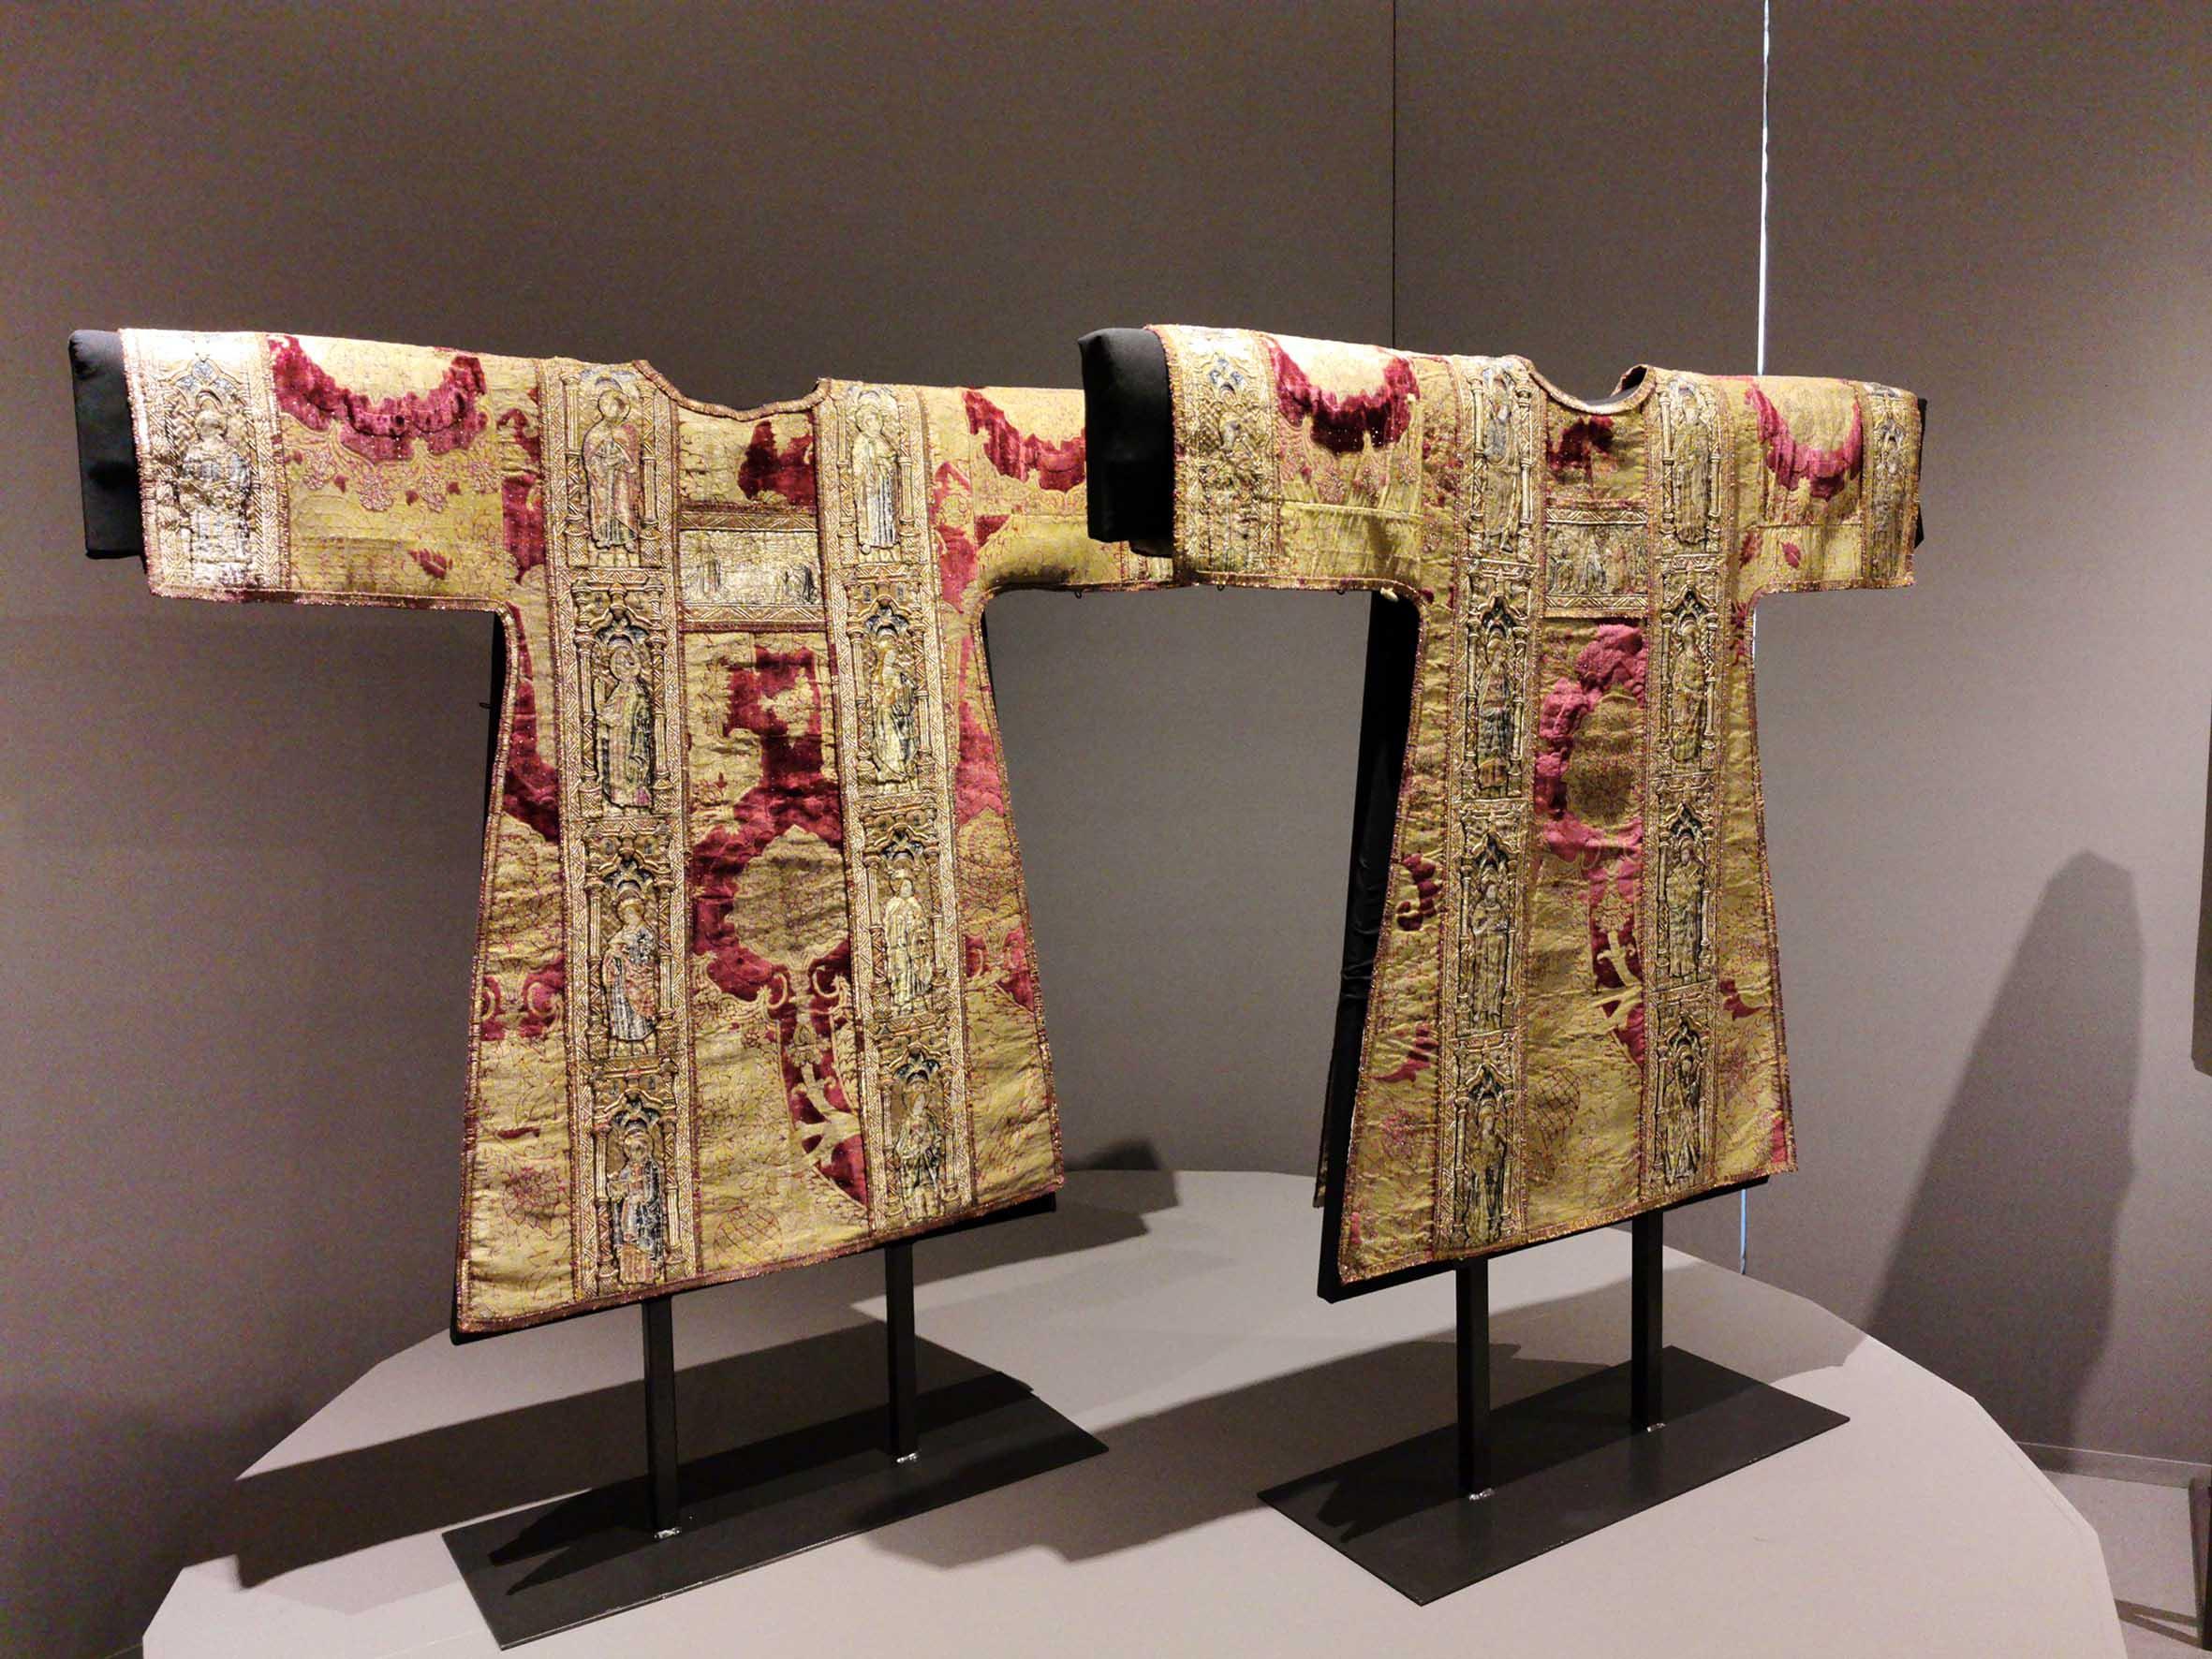 Fili d'oro e dipinti di seta